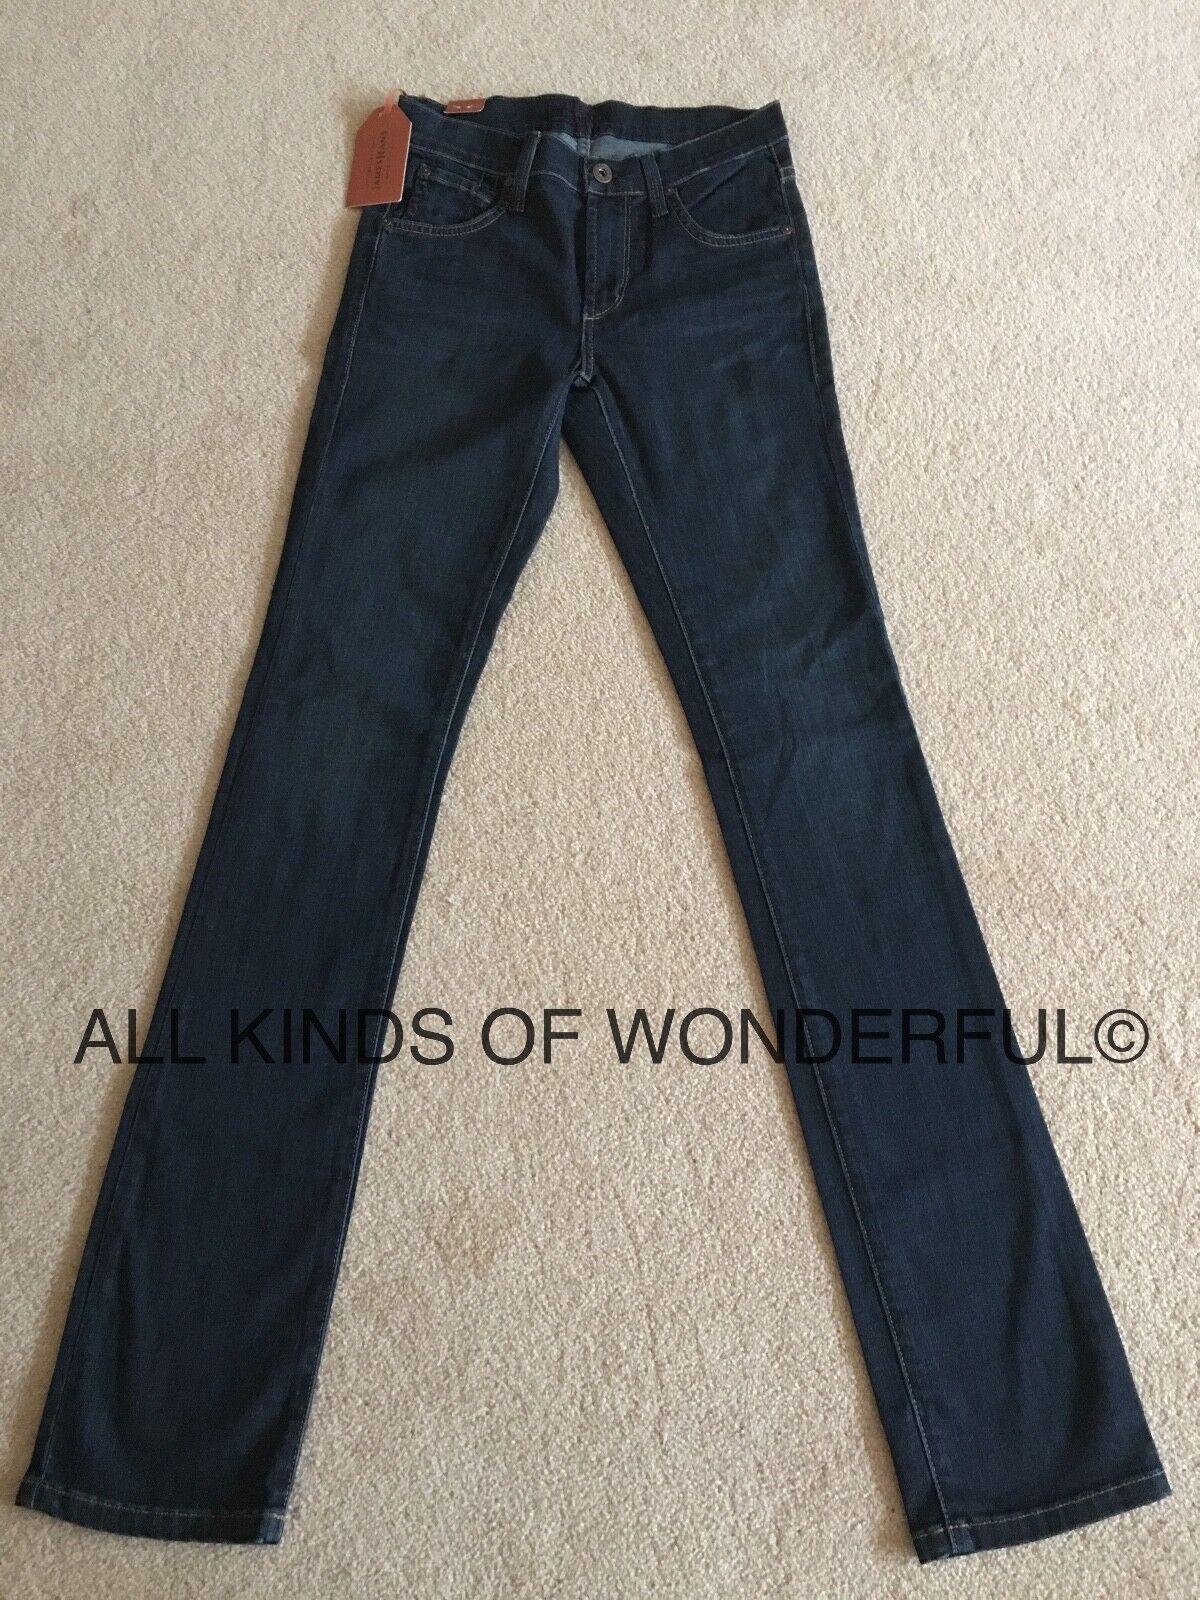 James High Rise Jeans Gamba Dritta in in in inverno blus (Dk blu) RRP  BNWT 53343a